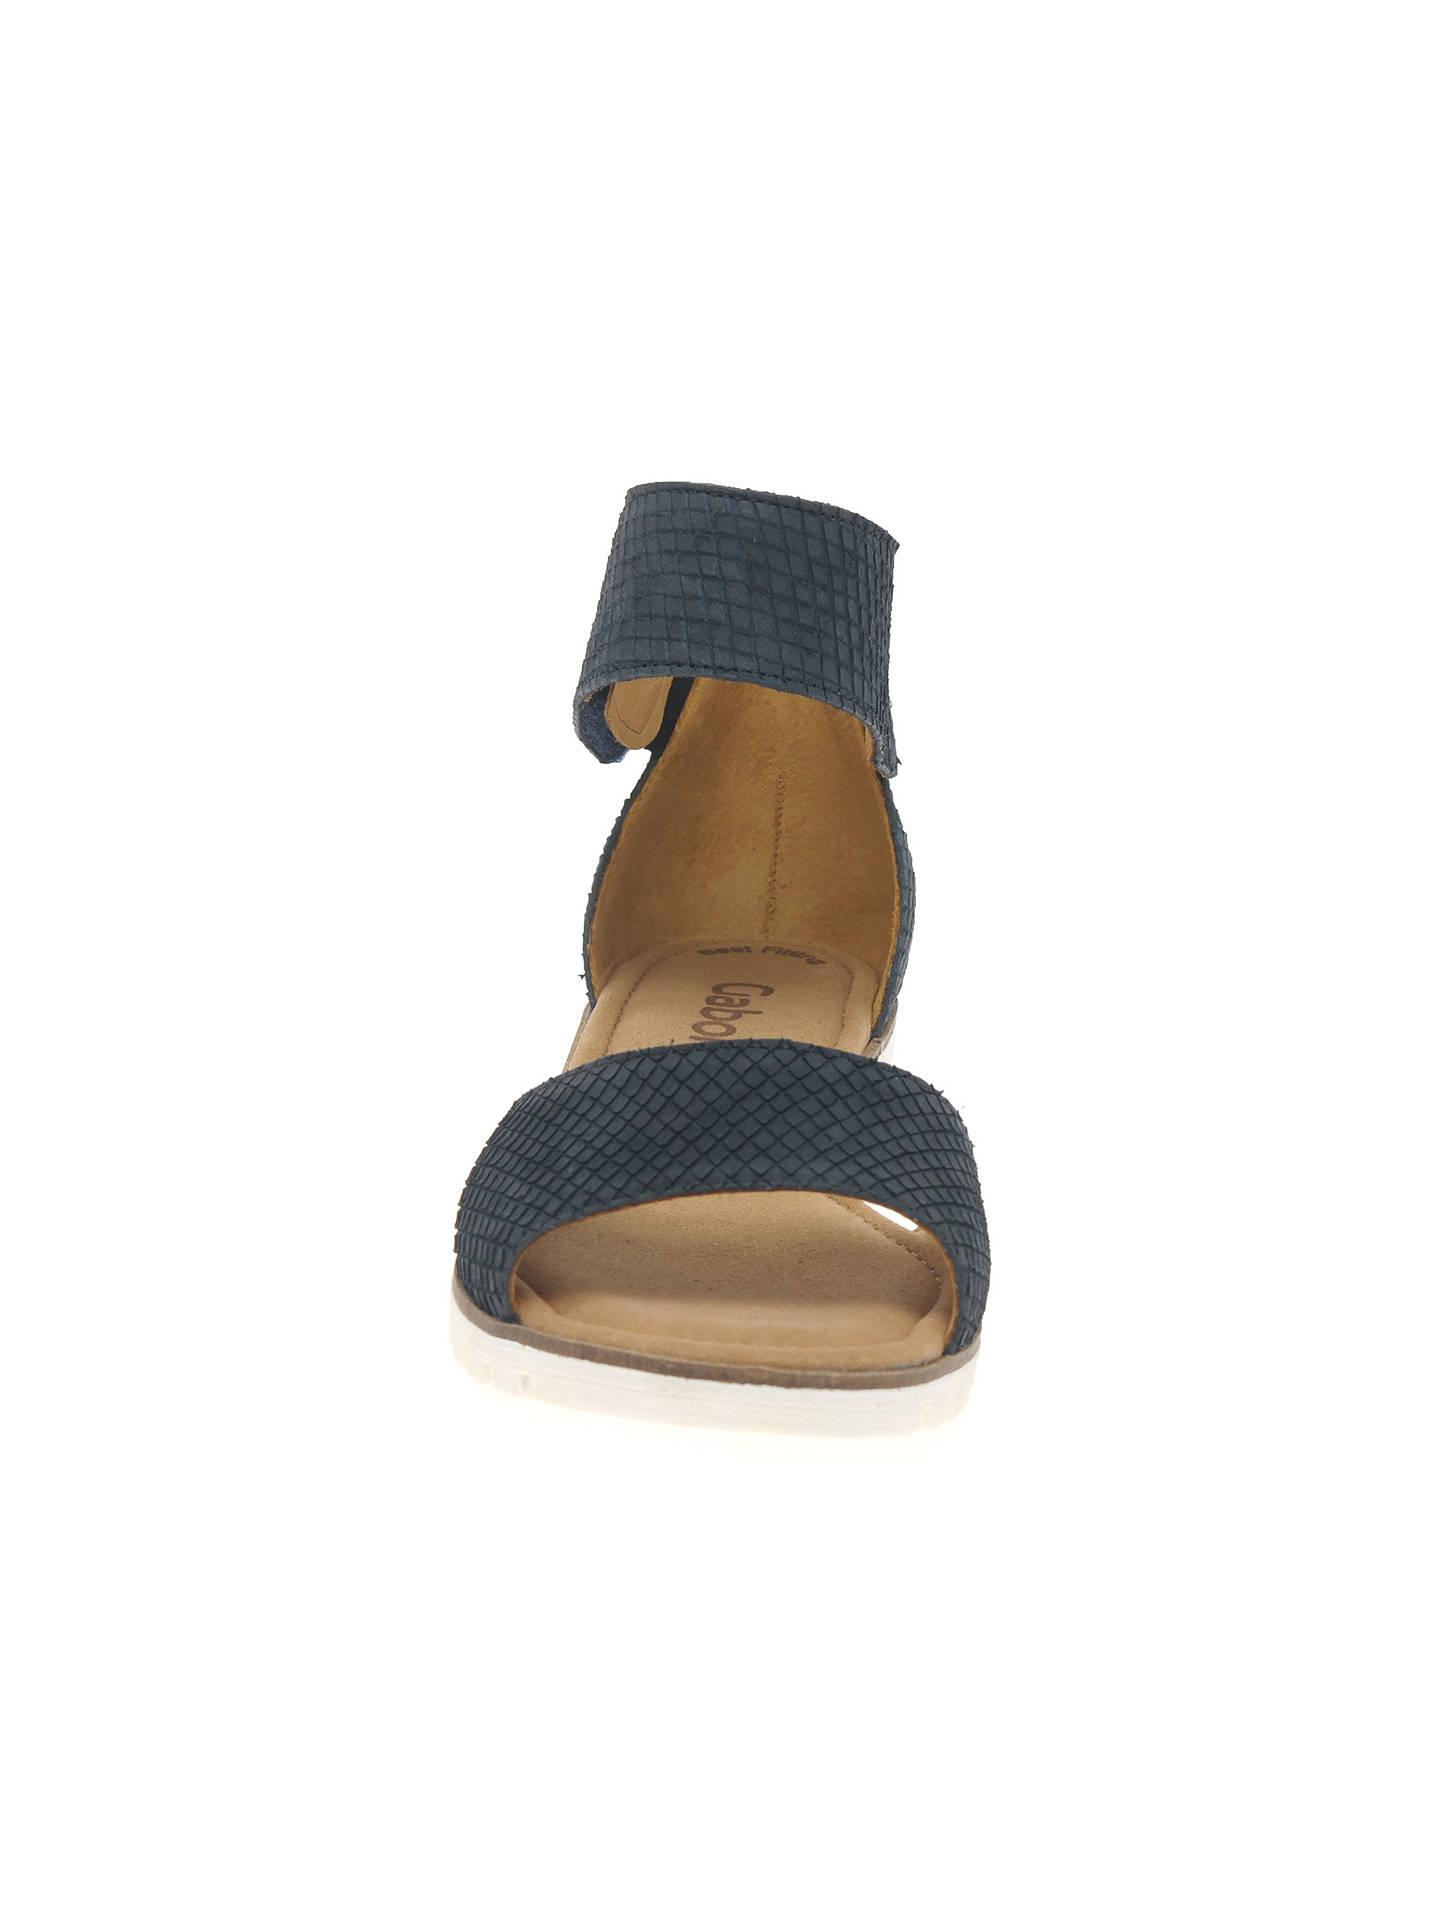 20fce52e5a58 ... Buy Gabor Penny Wedge Heeled Sandals